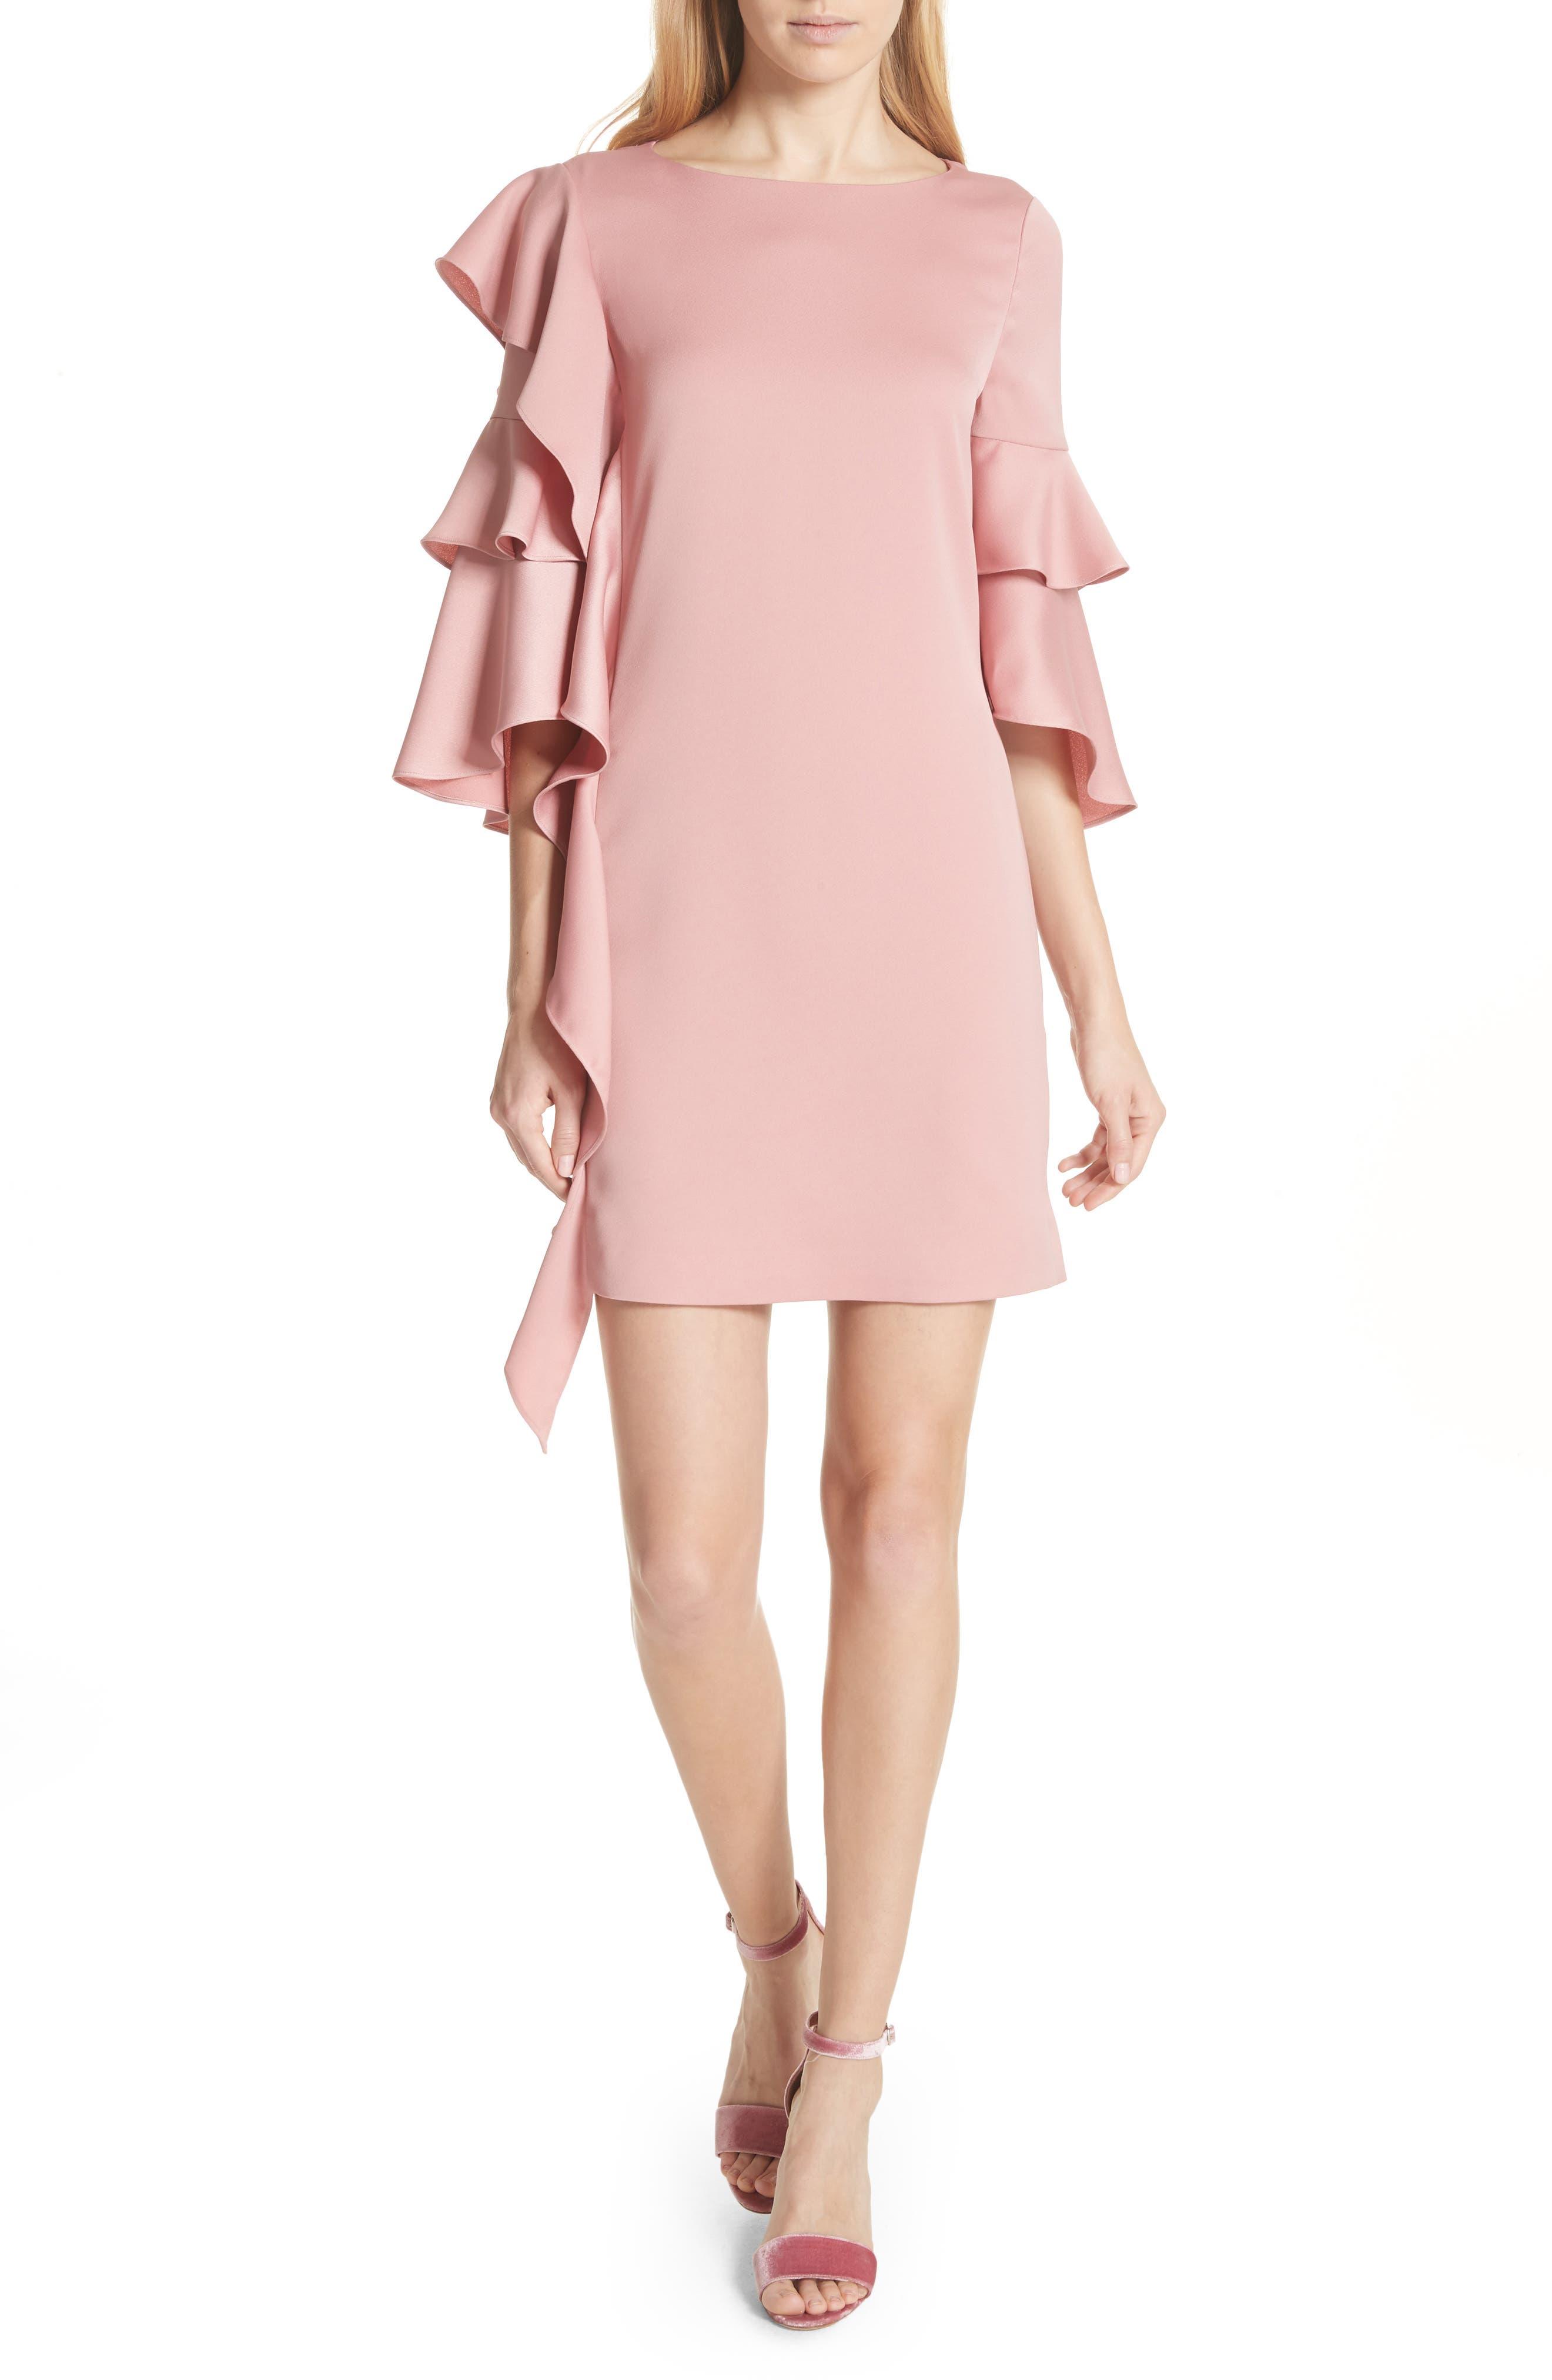 Ruffle Tunic Dress,                             Main thumbnail 1, color,                             660